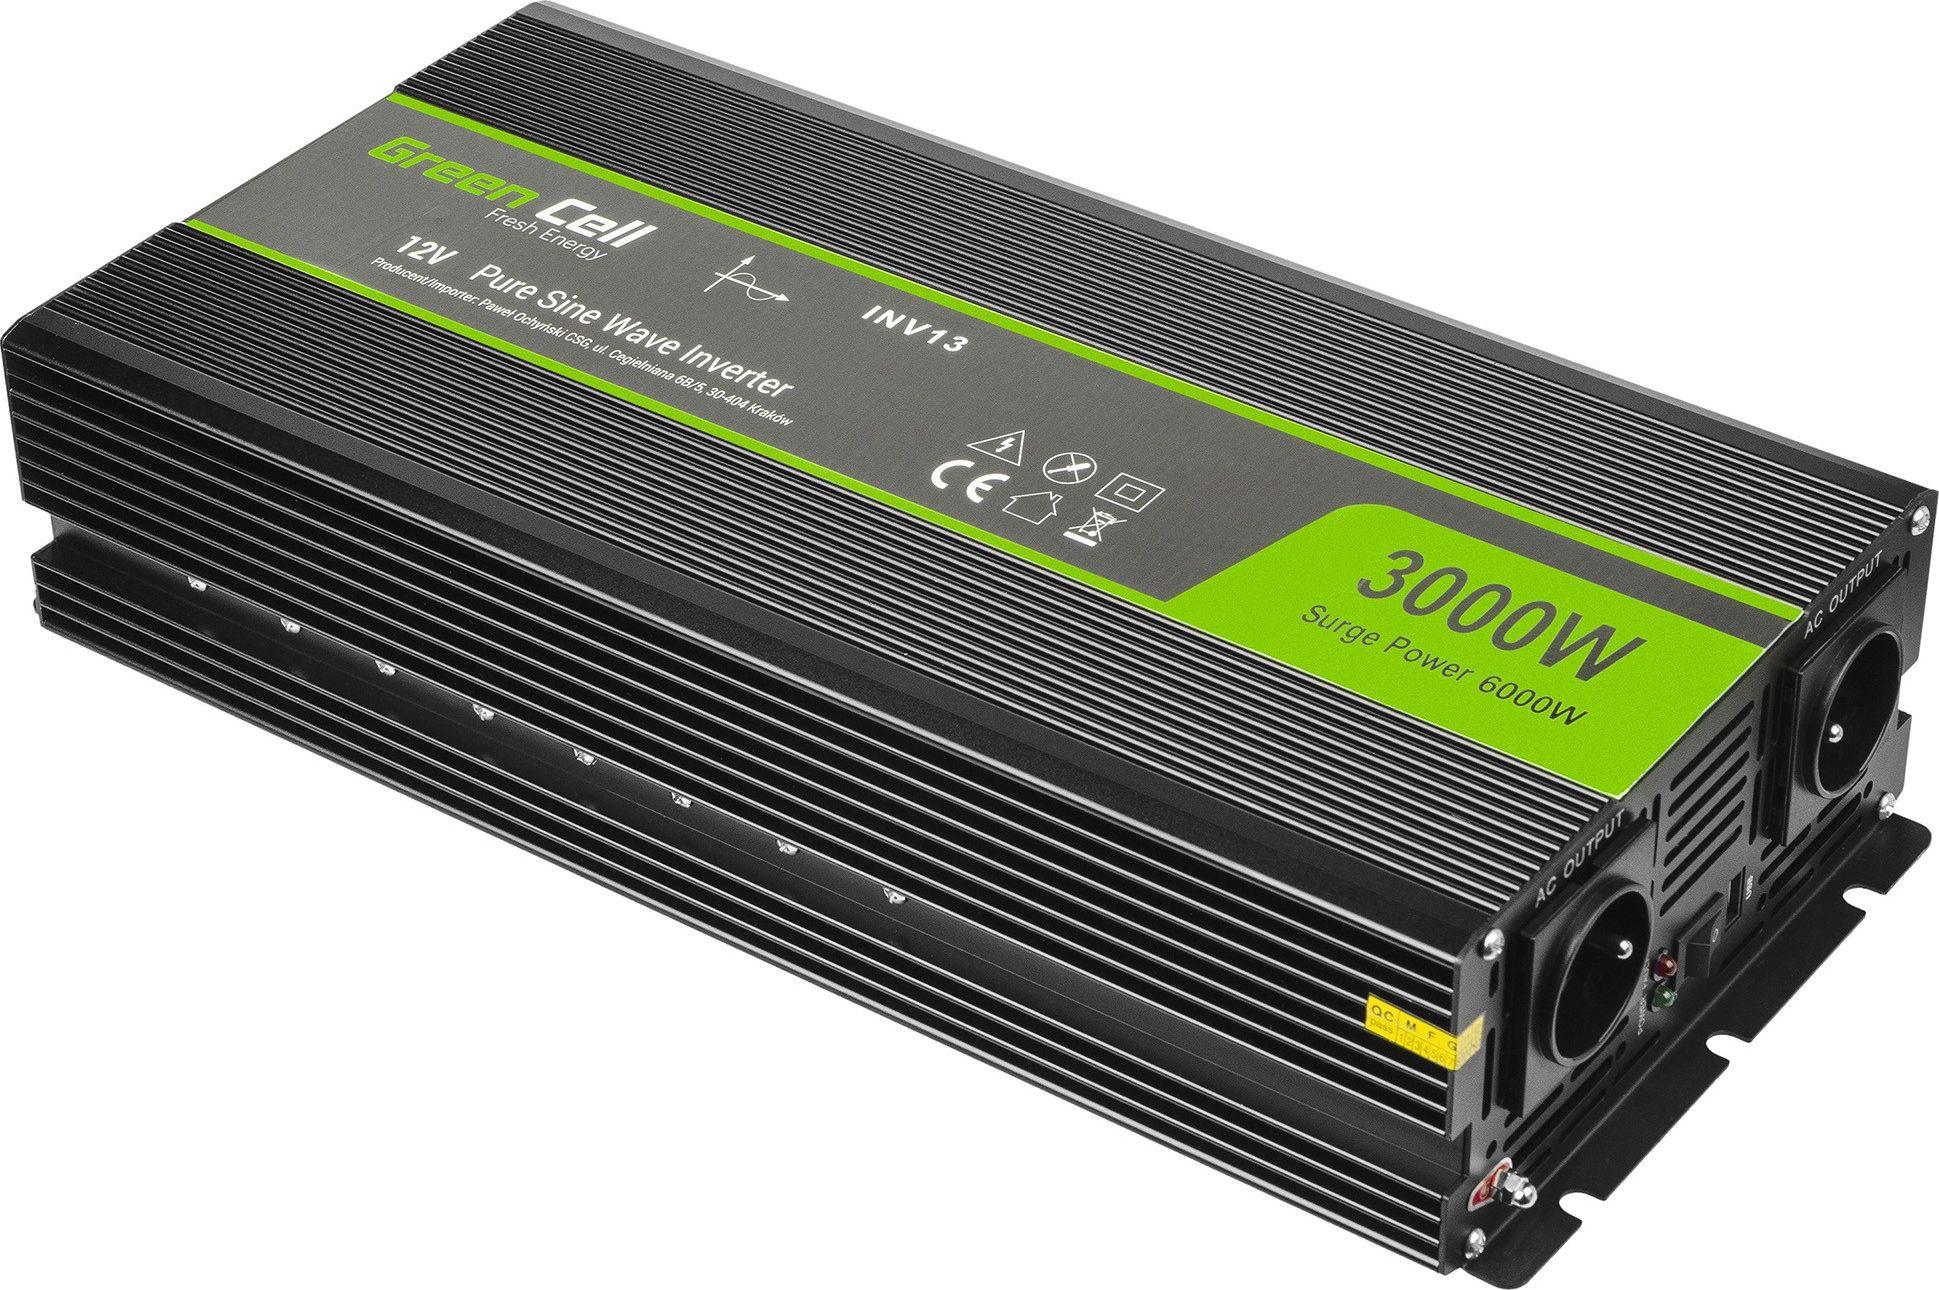 Green Cell  Registered  Voltage Car Inverter 12V to 230V, 3000W/6000W, Full Sine Wave Strāvas pārveidotājs, Power Inverter